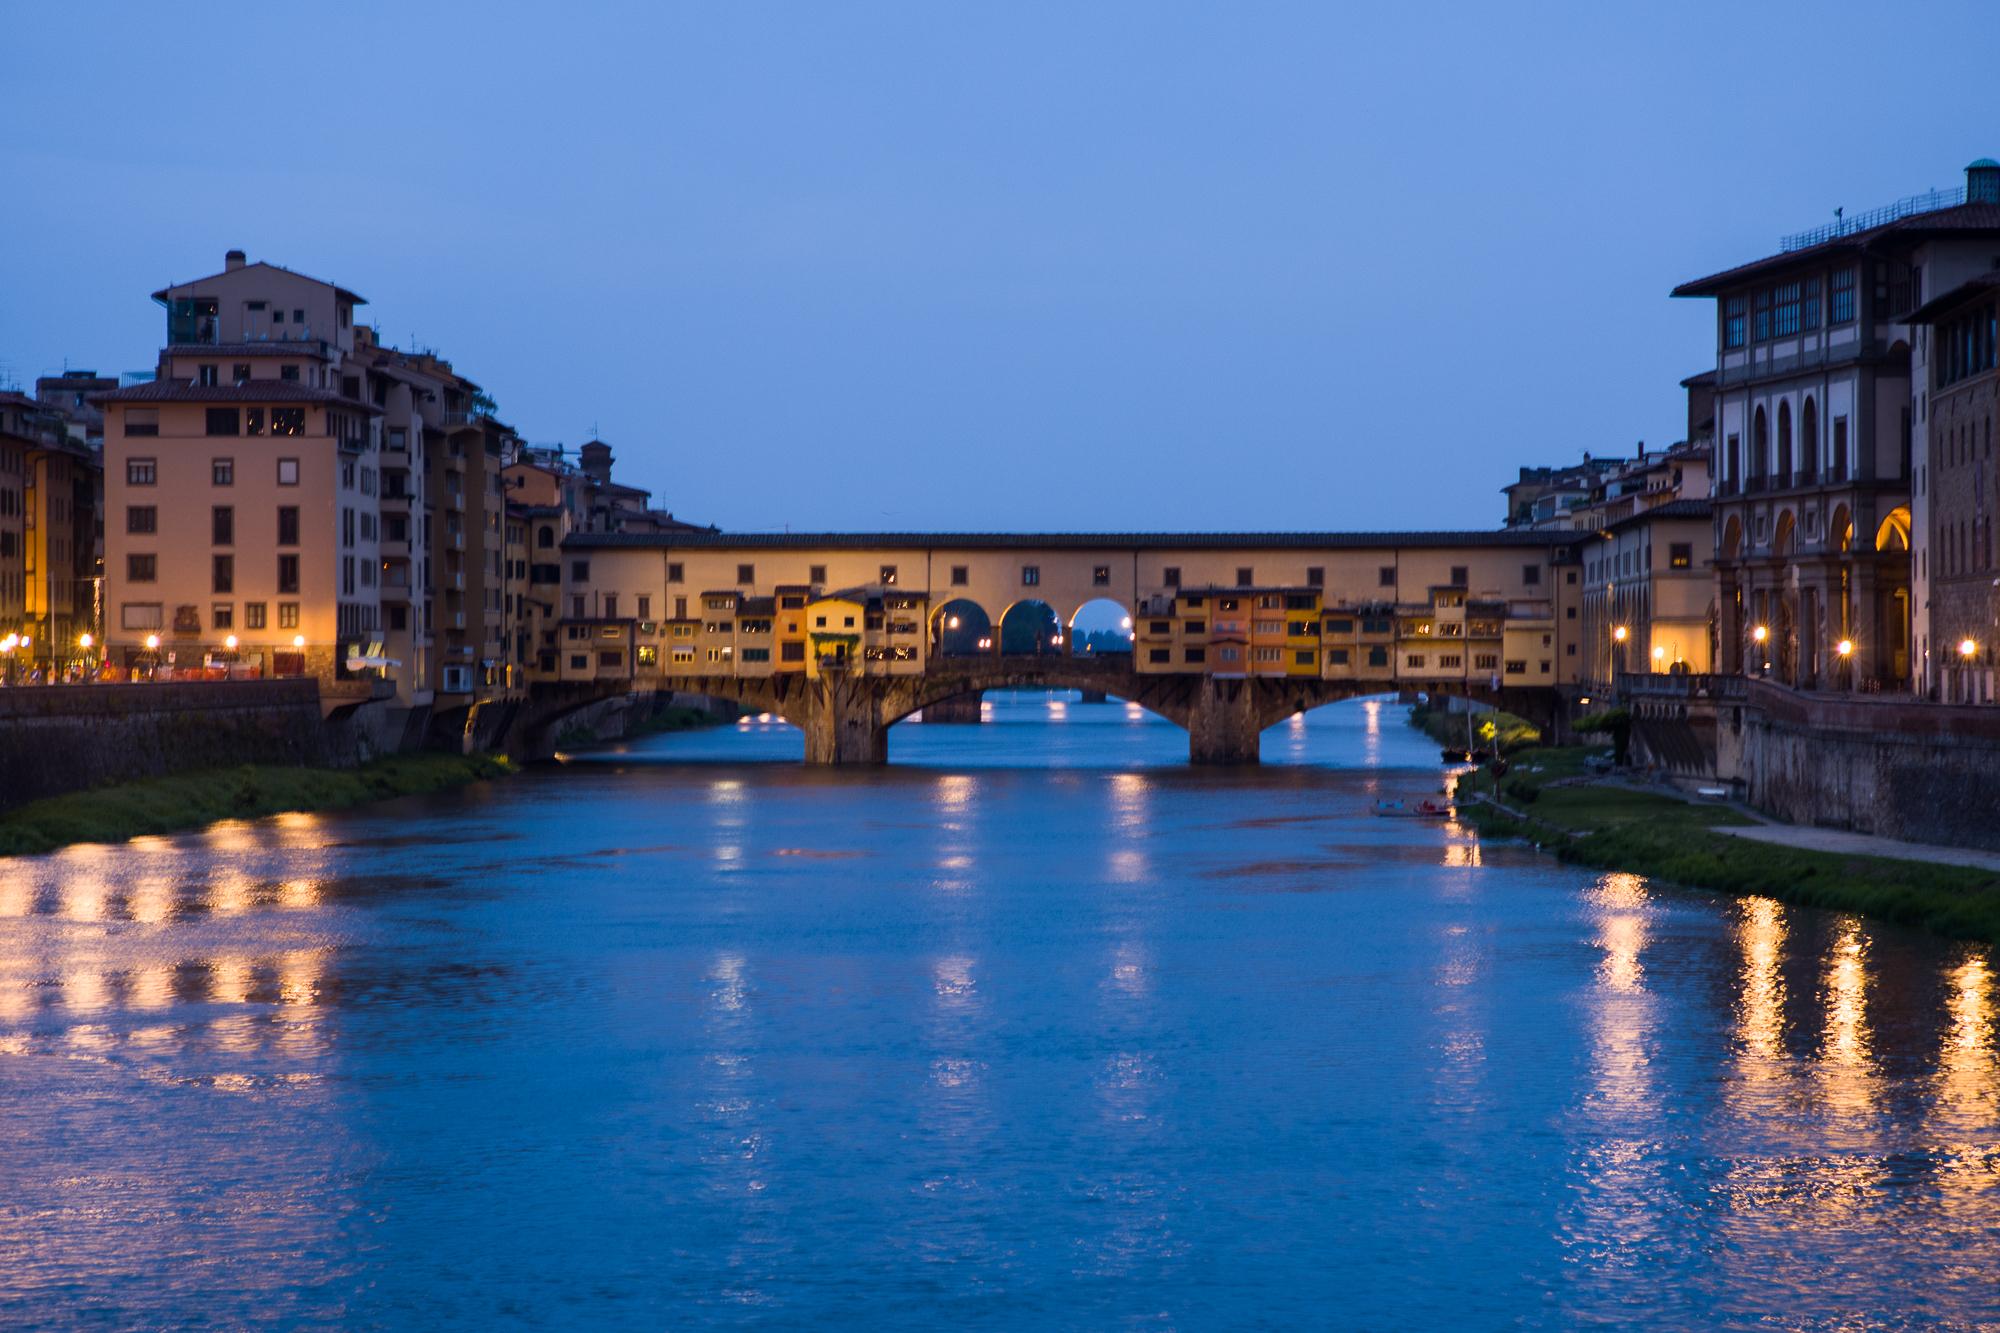 The Ponte Vecchio bridge in the early morning